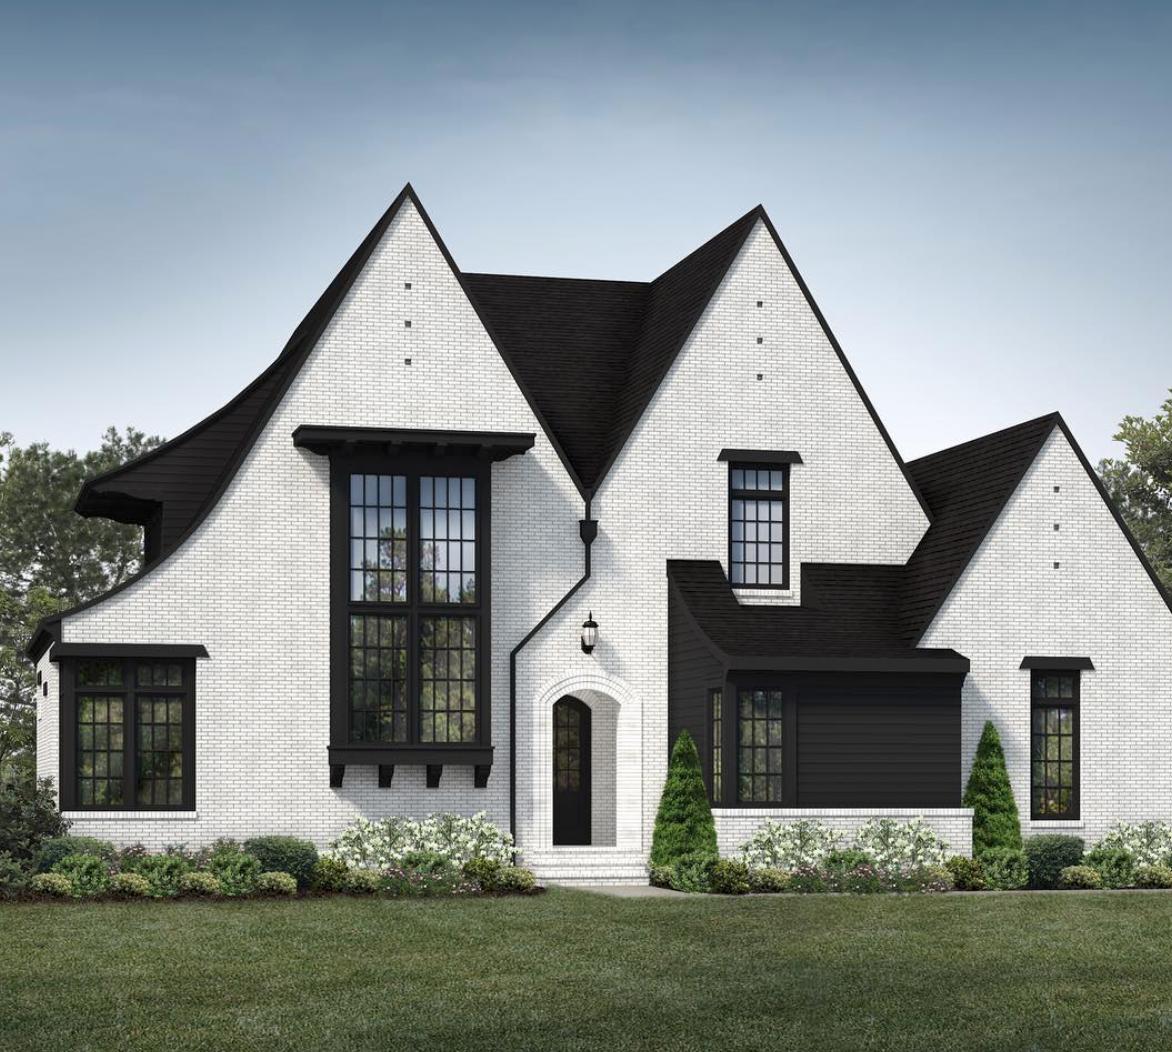 Home Home Design Architecture Dream House White And